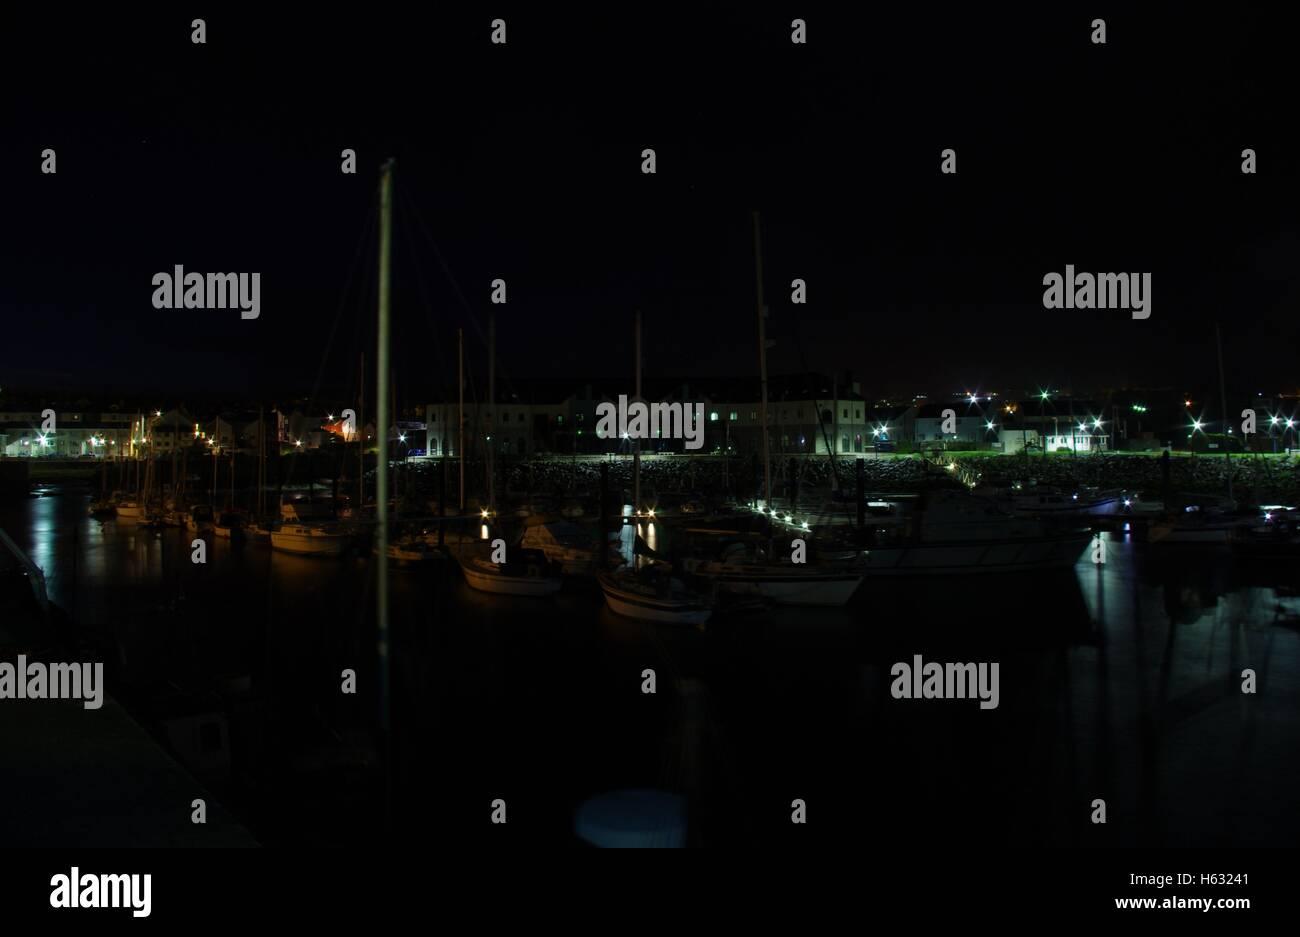 View overlooking Aberystwyth Harbour / Marina at night facing towards Y Lanfa, Trefechen, shot taken with long exposure. - Stock Image